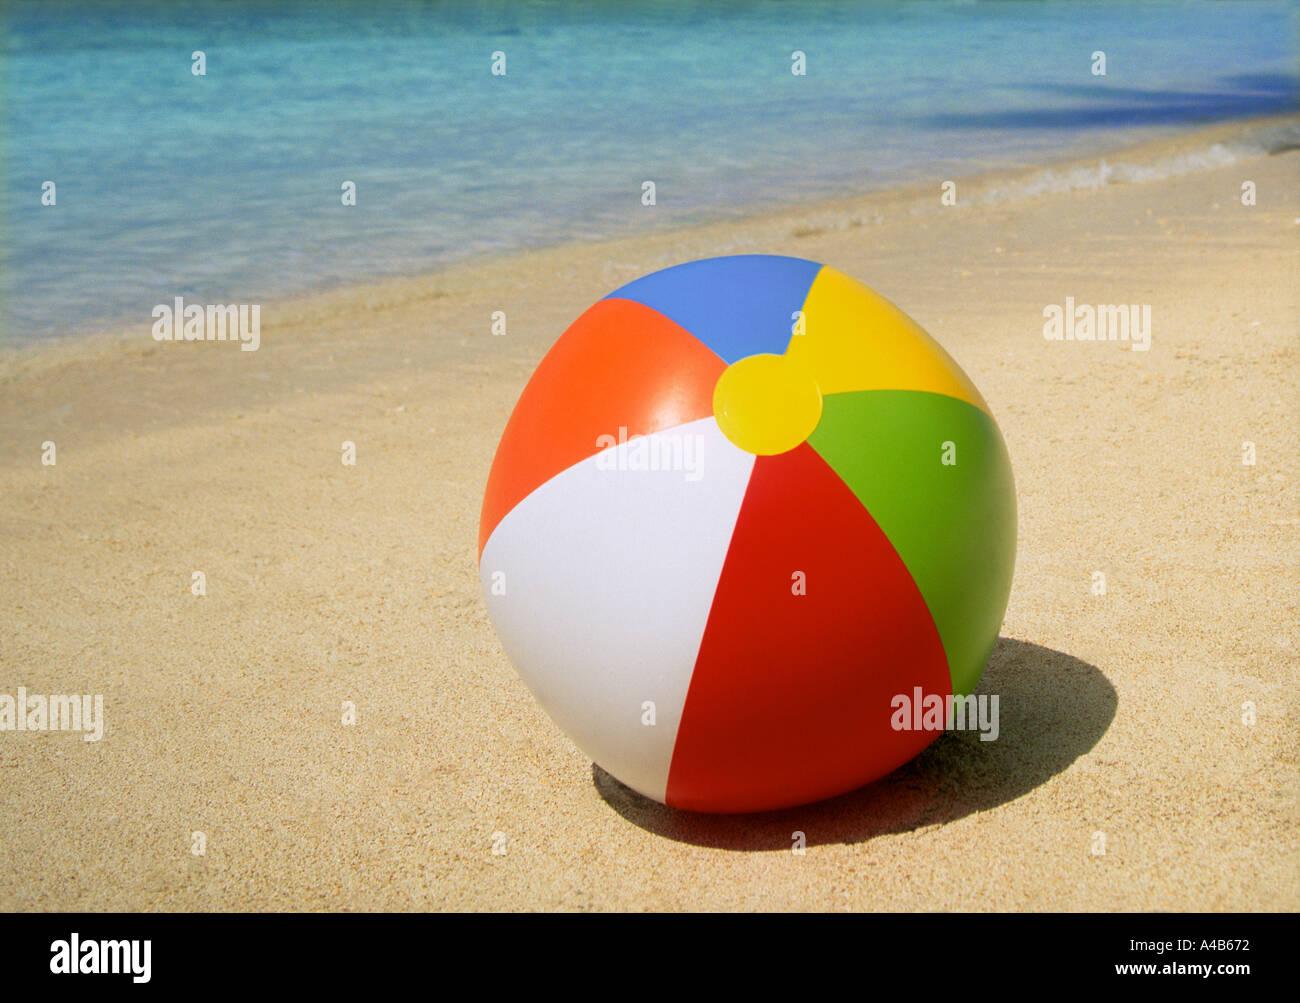 Beach ball in sand Toy Beach Ball On Tropical Beach Maldives Indian Ocean Stock Image People Inflatable Beach Ball On Sand Stock Photos Inflatable Beach Ball